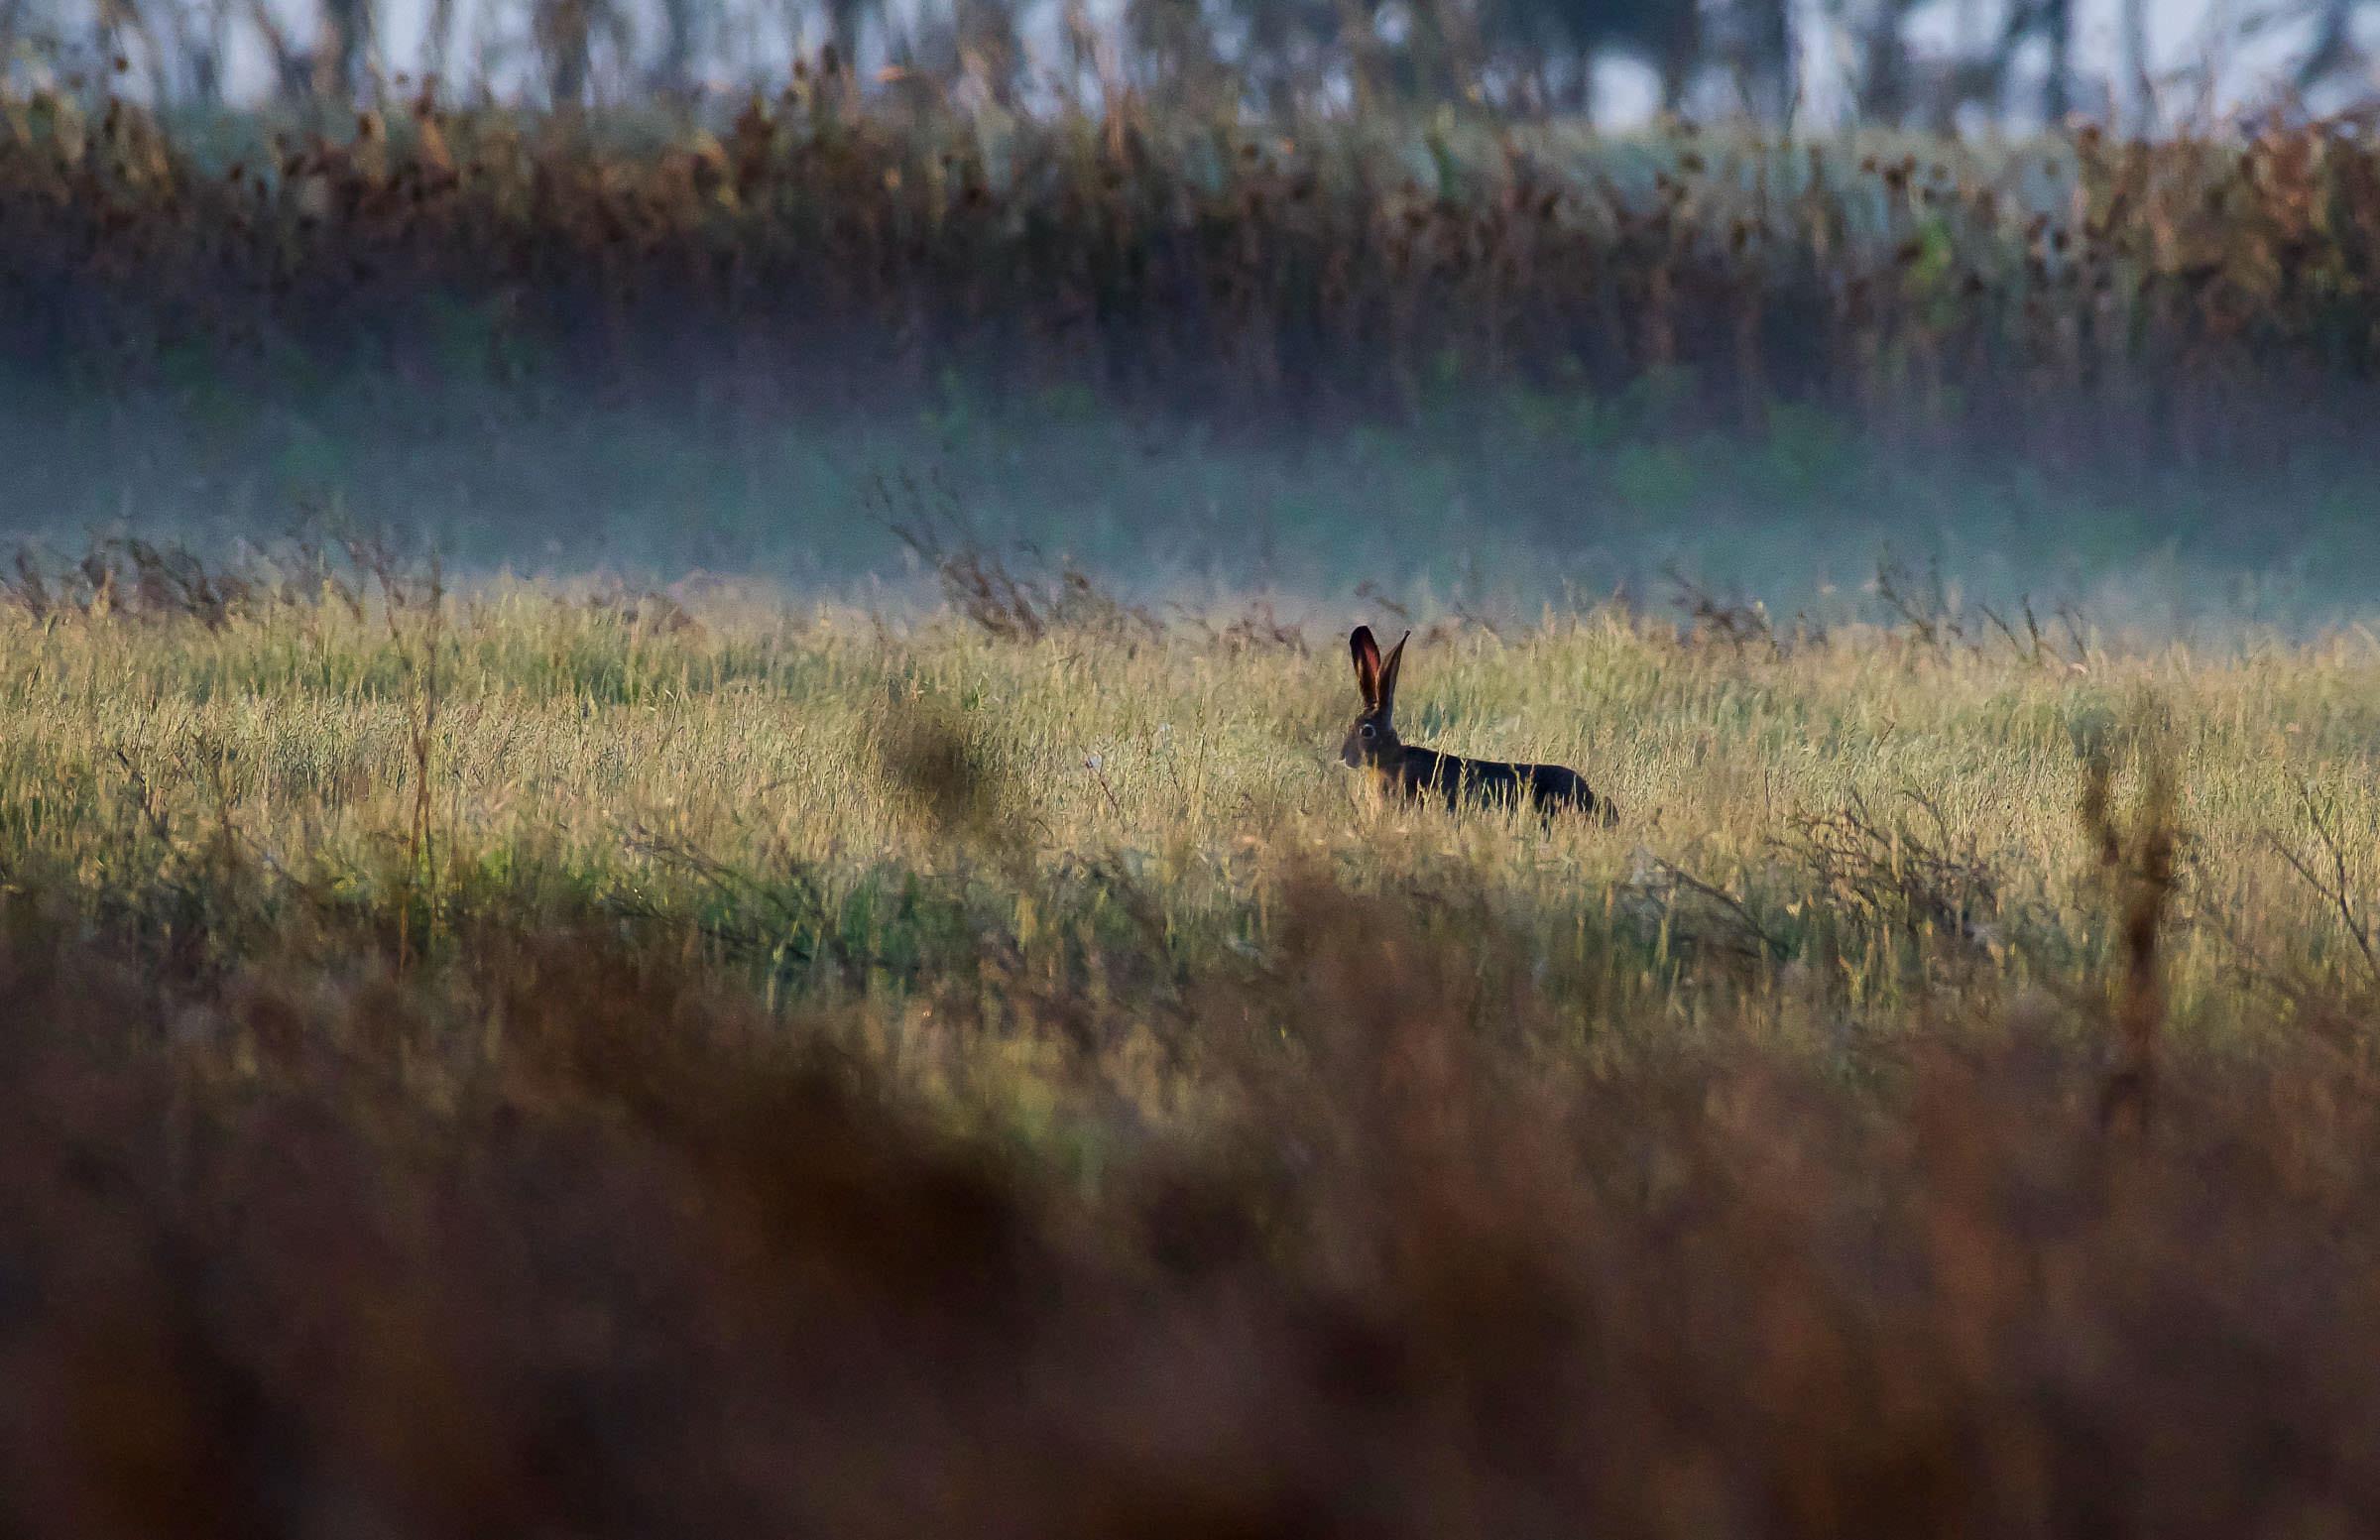 northern_harrier_hunting_jackrabbit-6.jpg